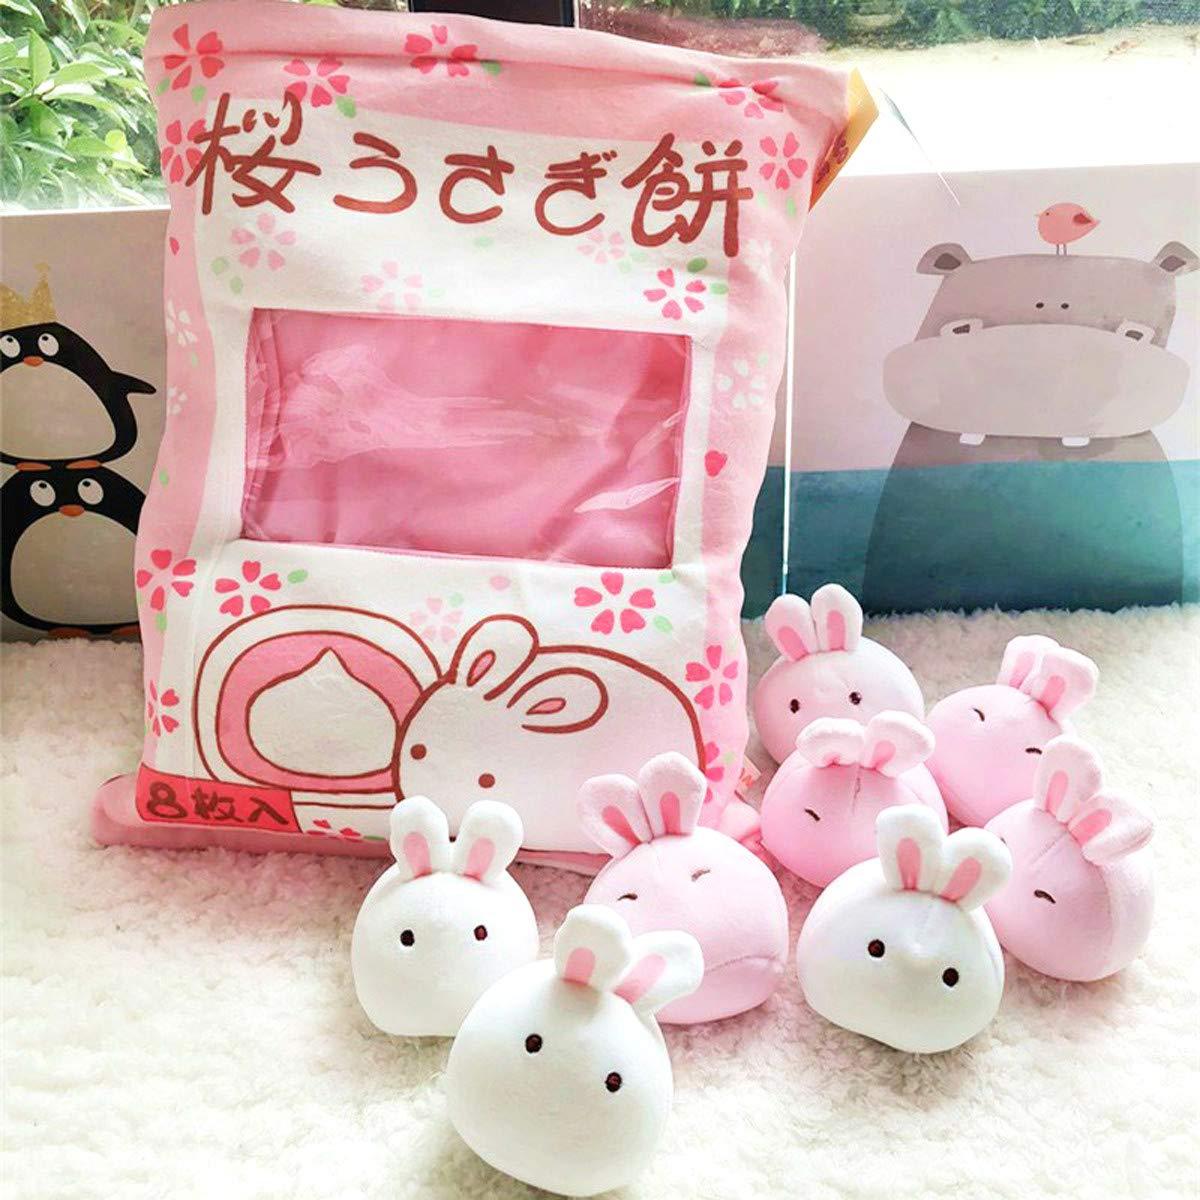 Nenalayo Cute Throw Pillow Stuffed Animal Toys Removable Fluffy Bunnies Creative Gifts for Teens Girls Kids by Nenalayo (Image #2)